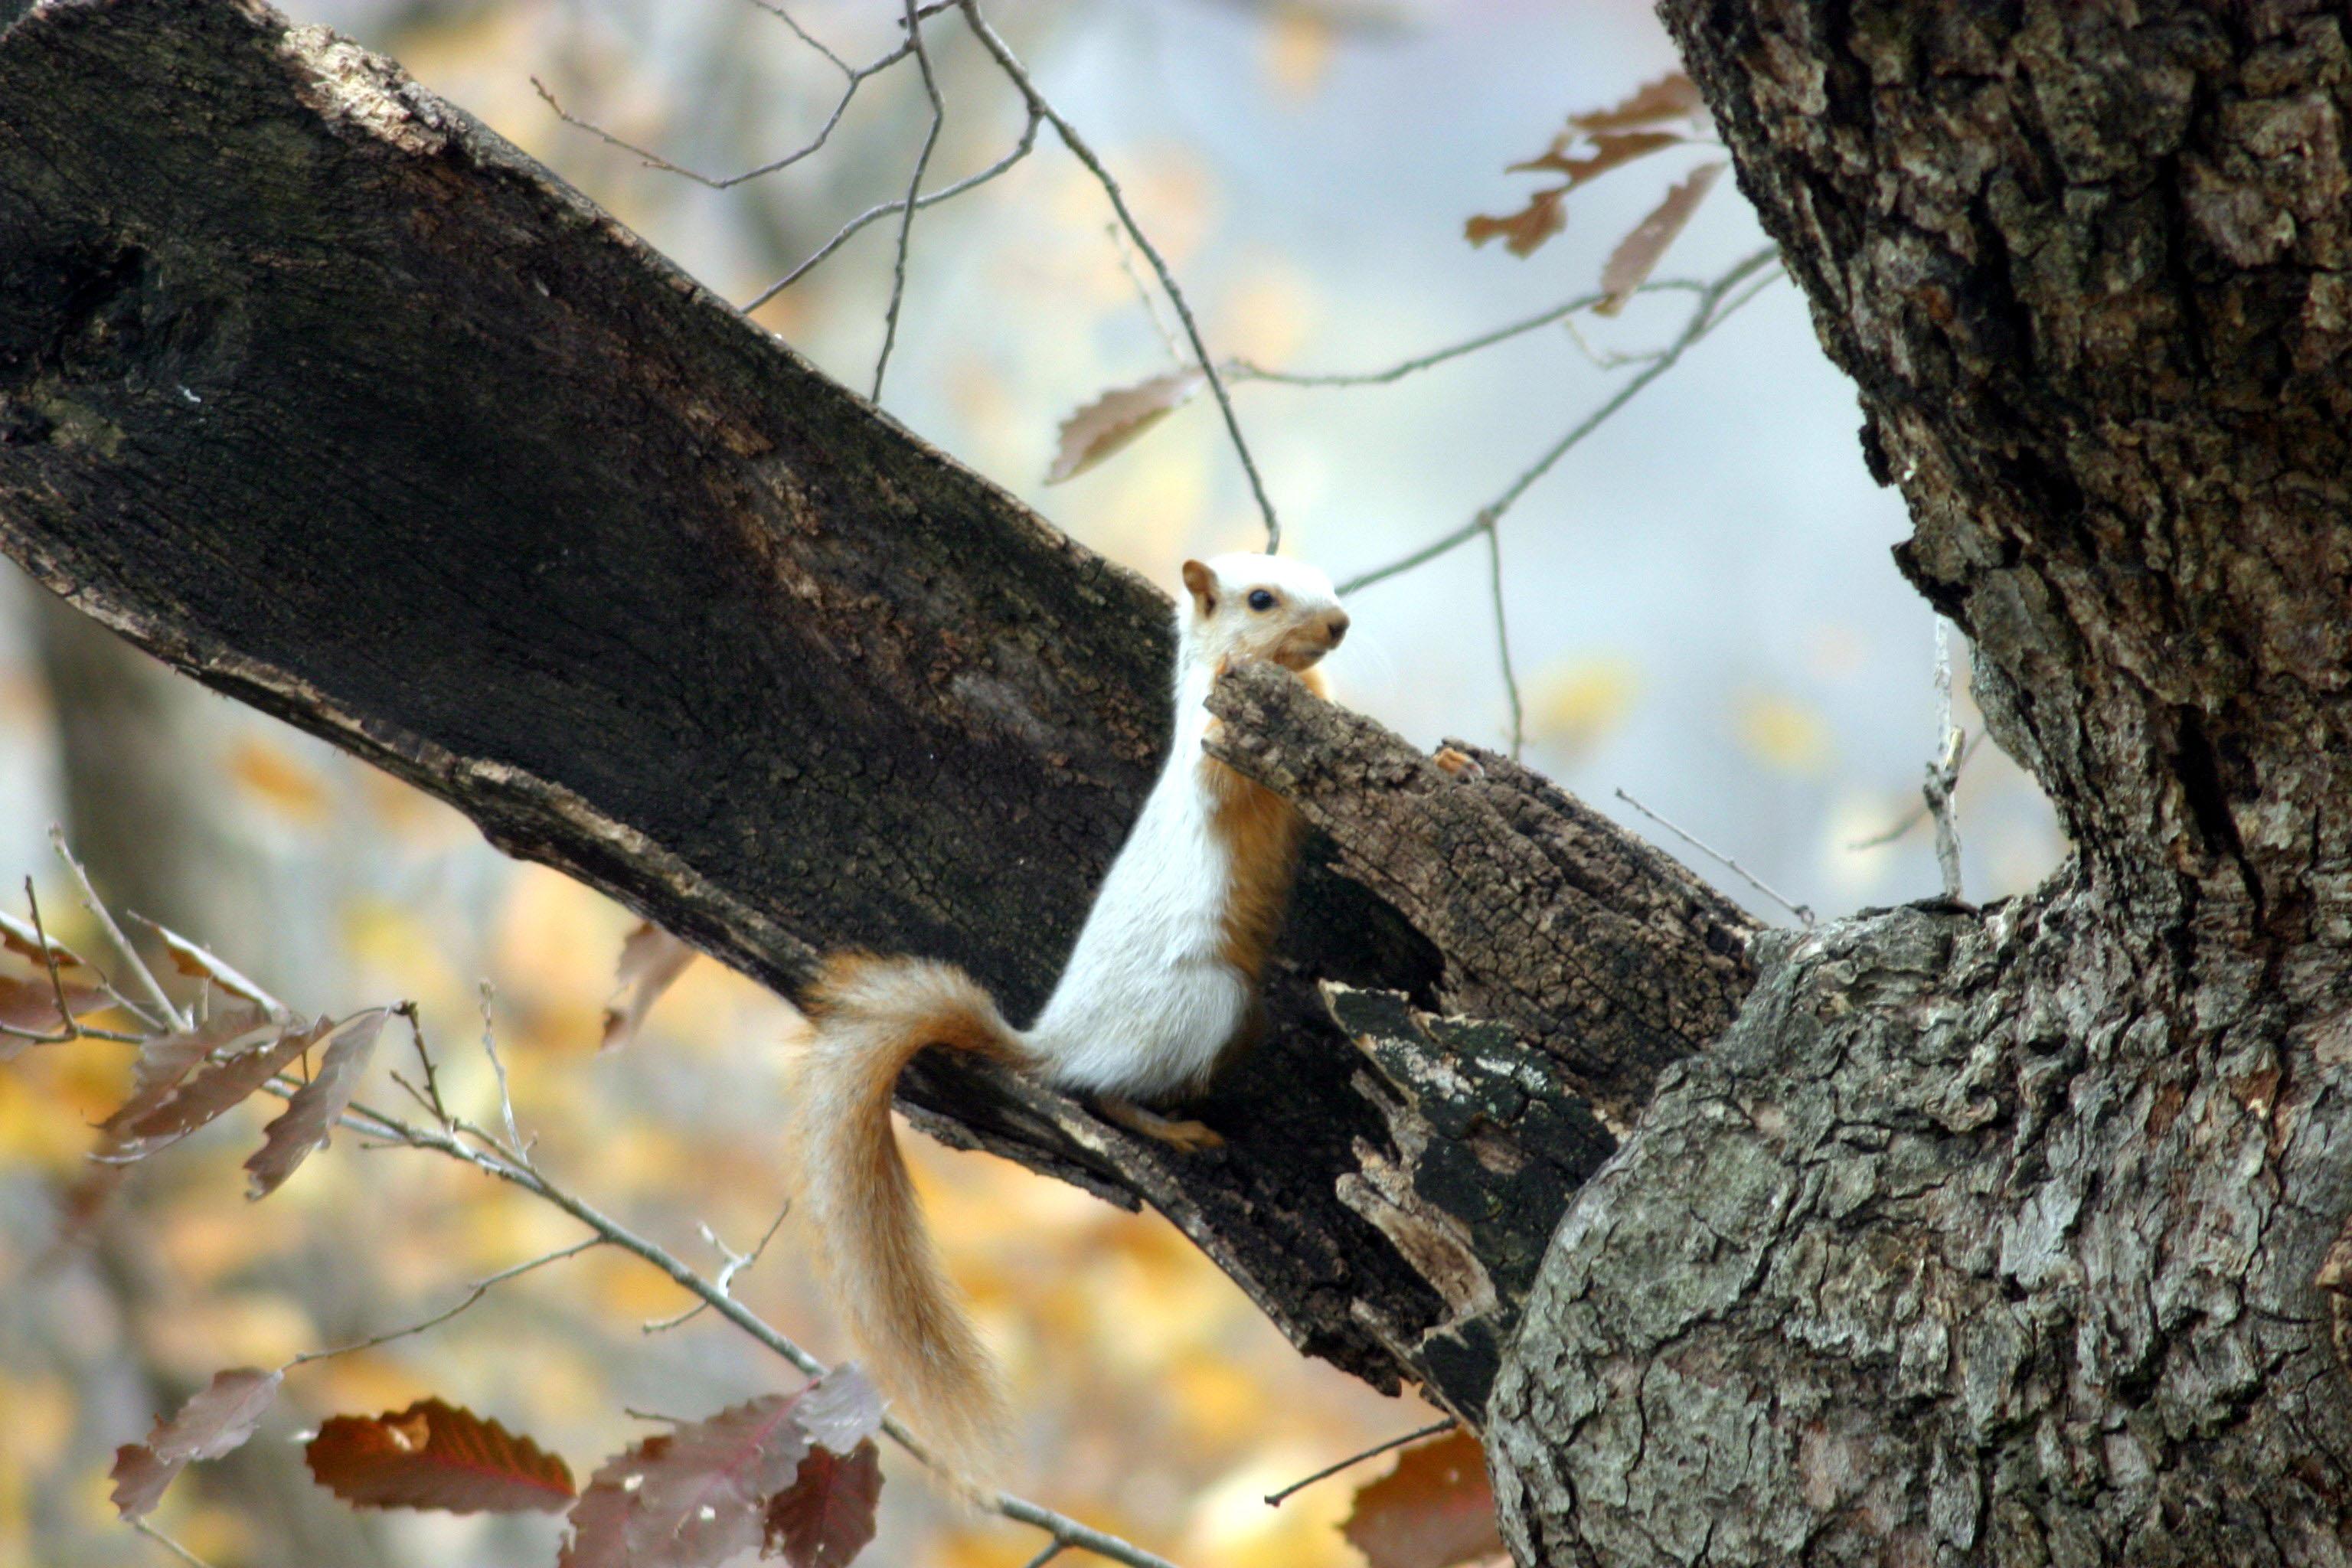 White Squirrel 27NOV05.jpg